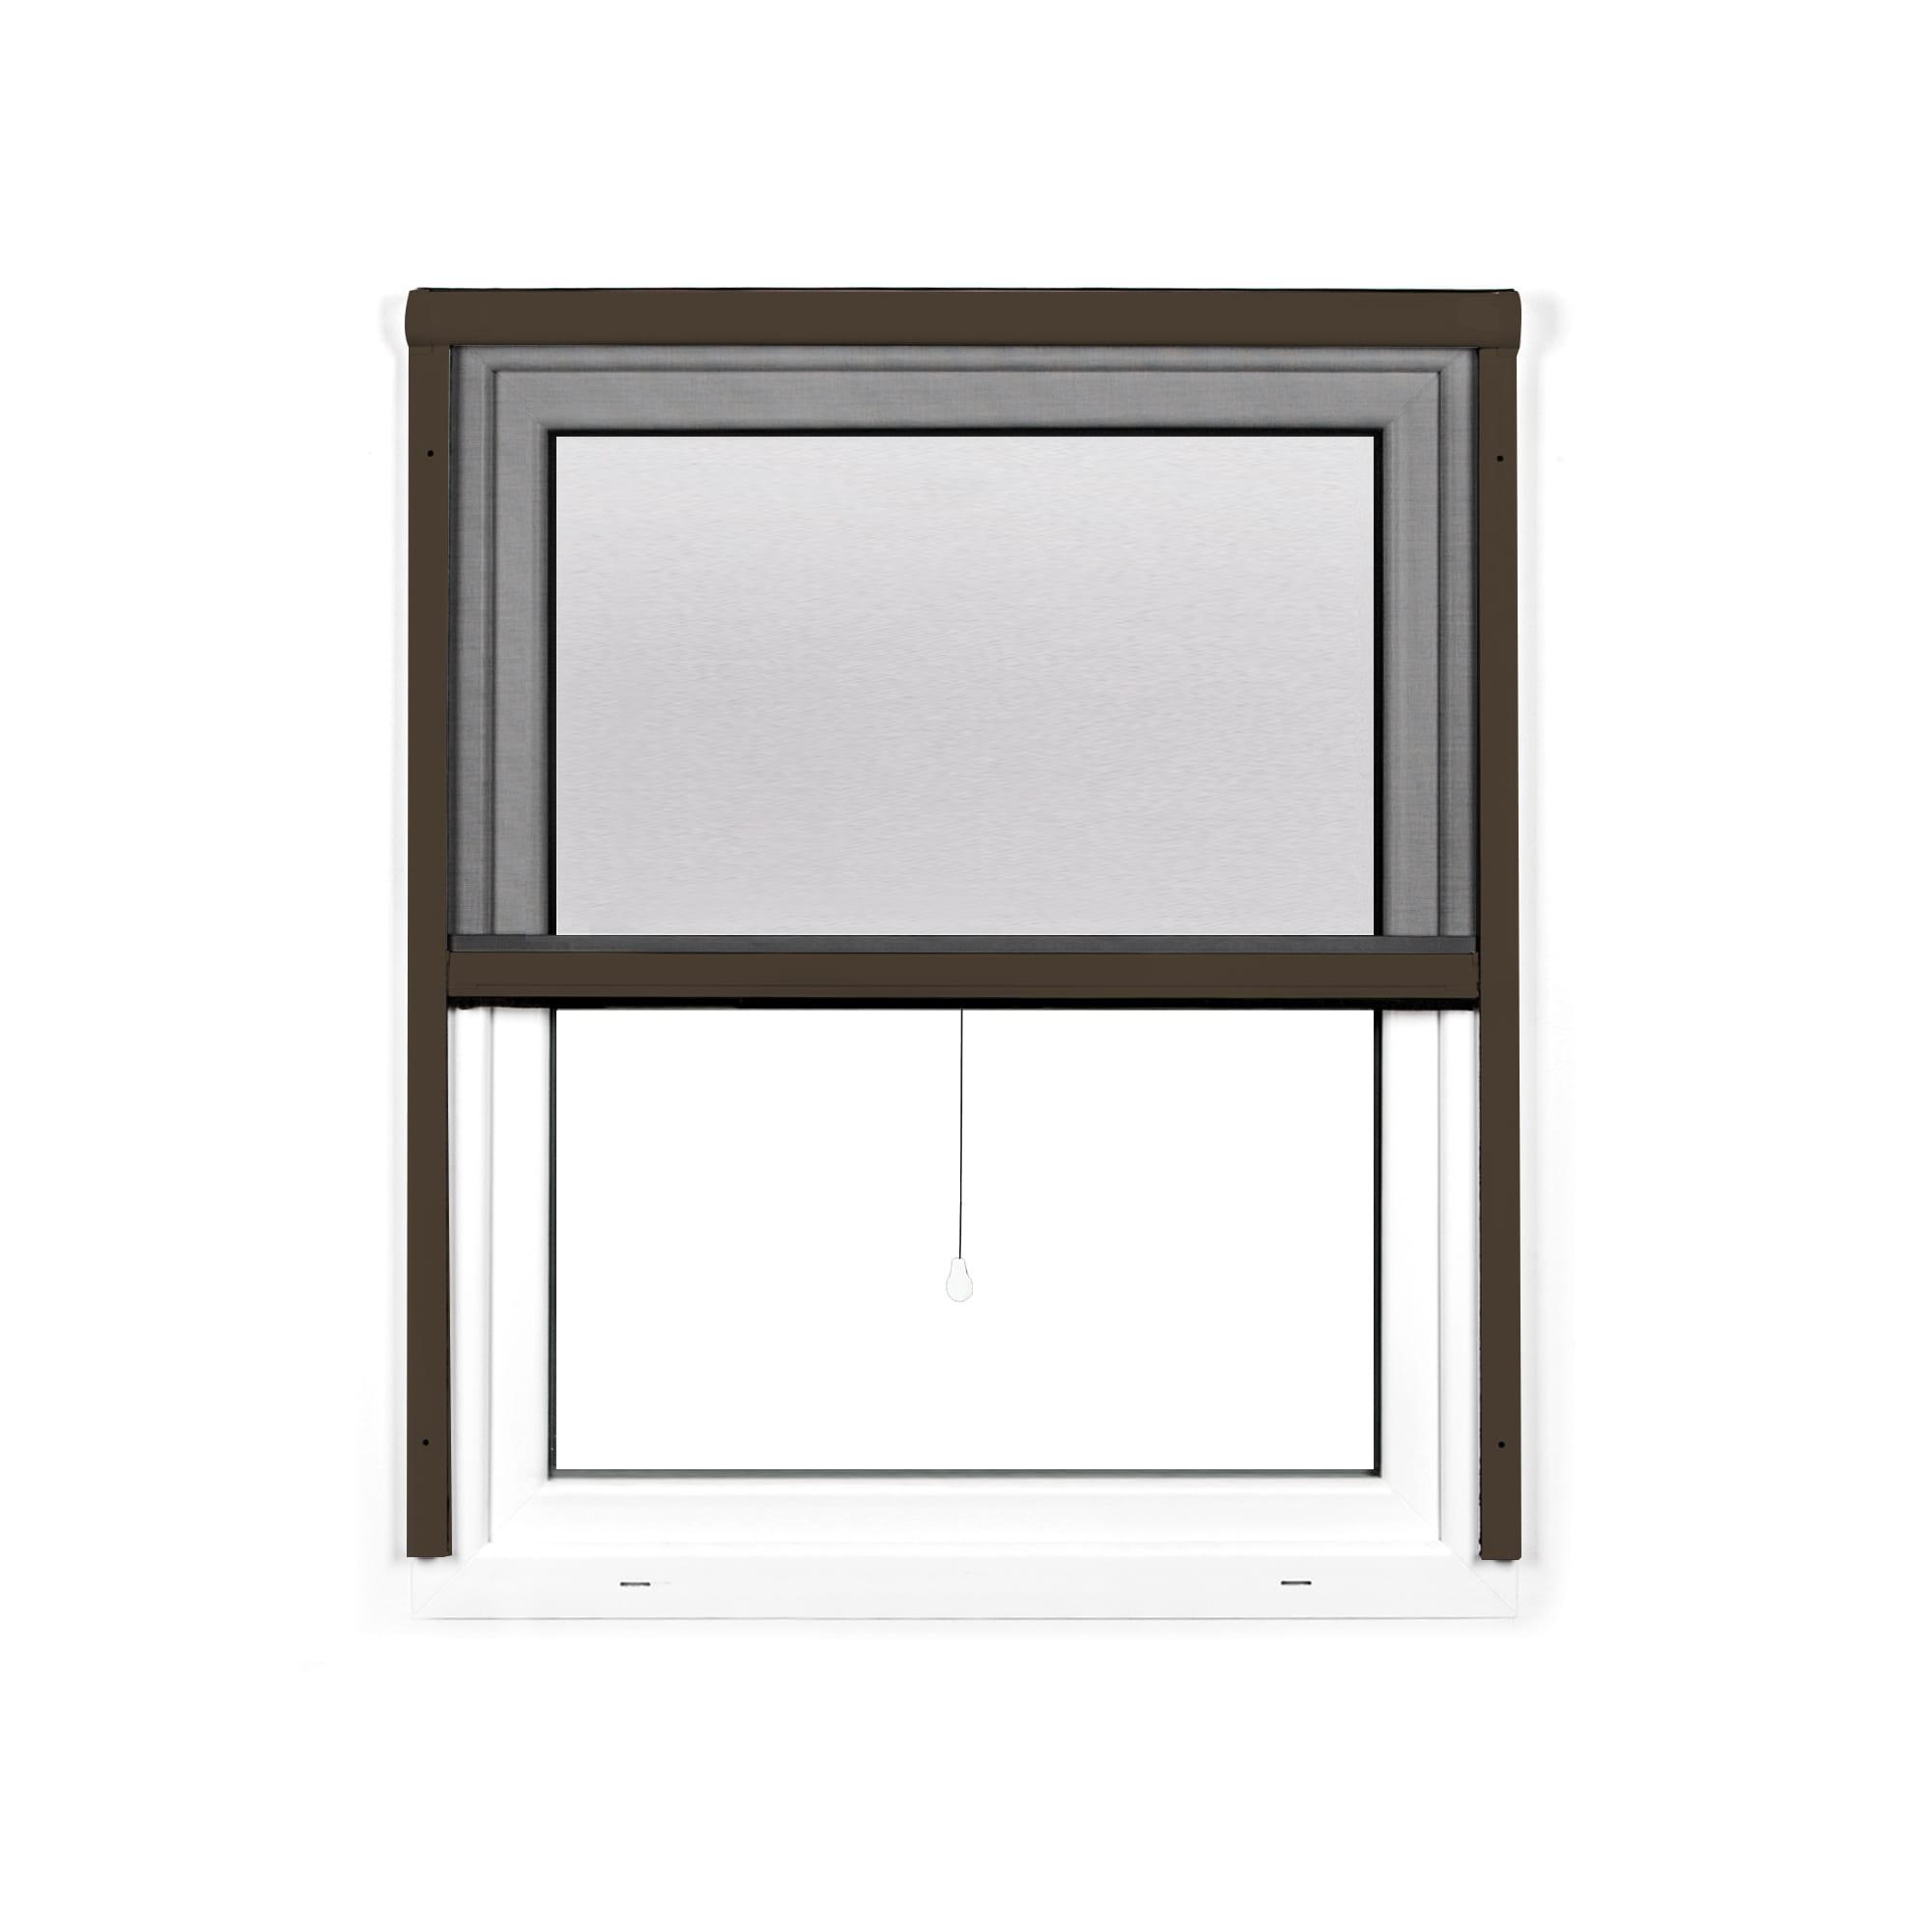 insektenschutz fliegengitter fenster insektenschutzrollo. Black Bedroom Furniture Sets. Home Design Ideas